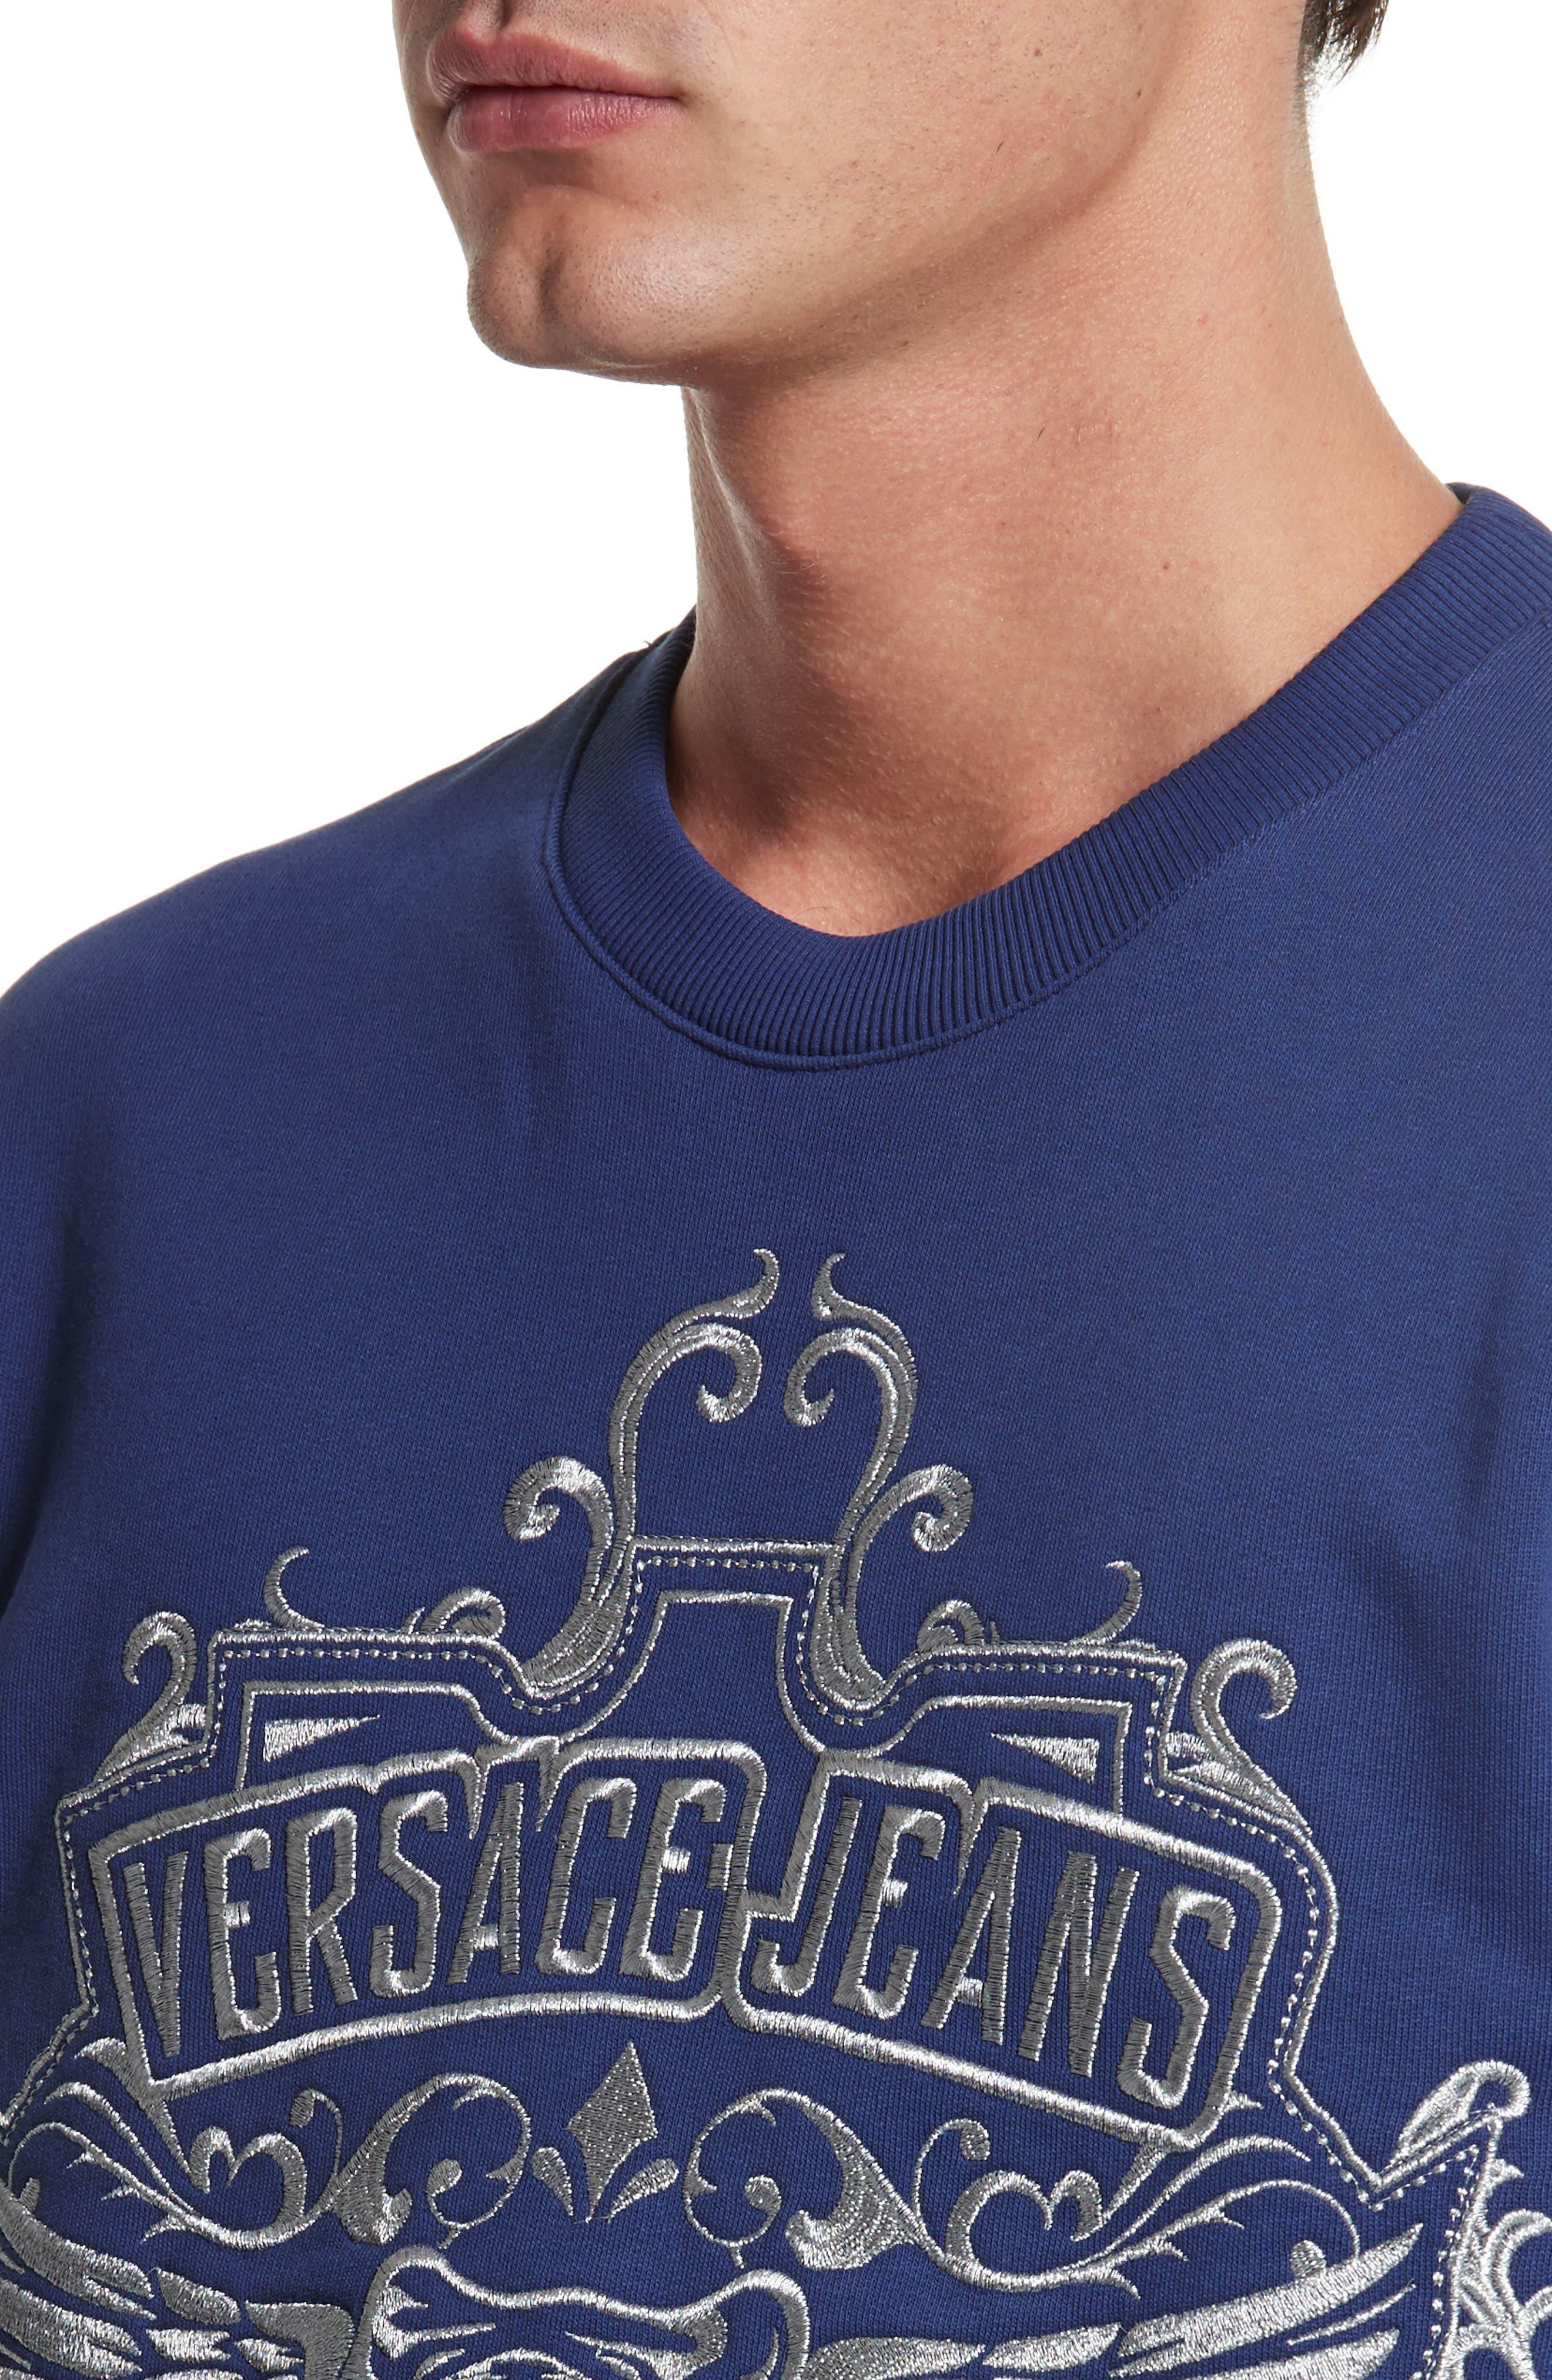 Embroidered Crewneck Sweatshirt,                             Alternate thumbnail 4, color,                             Blue